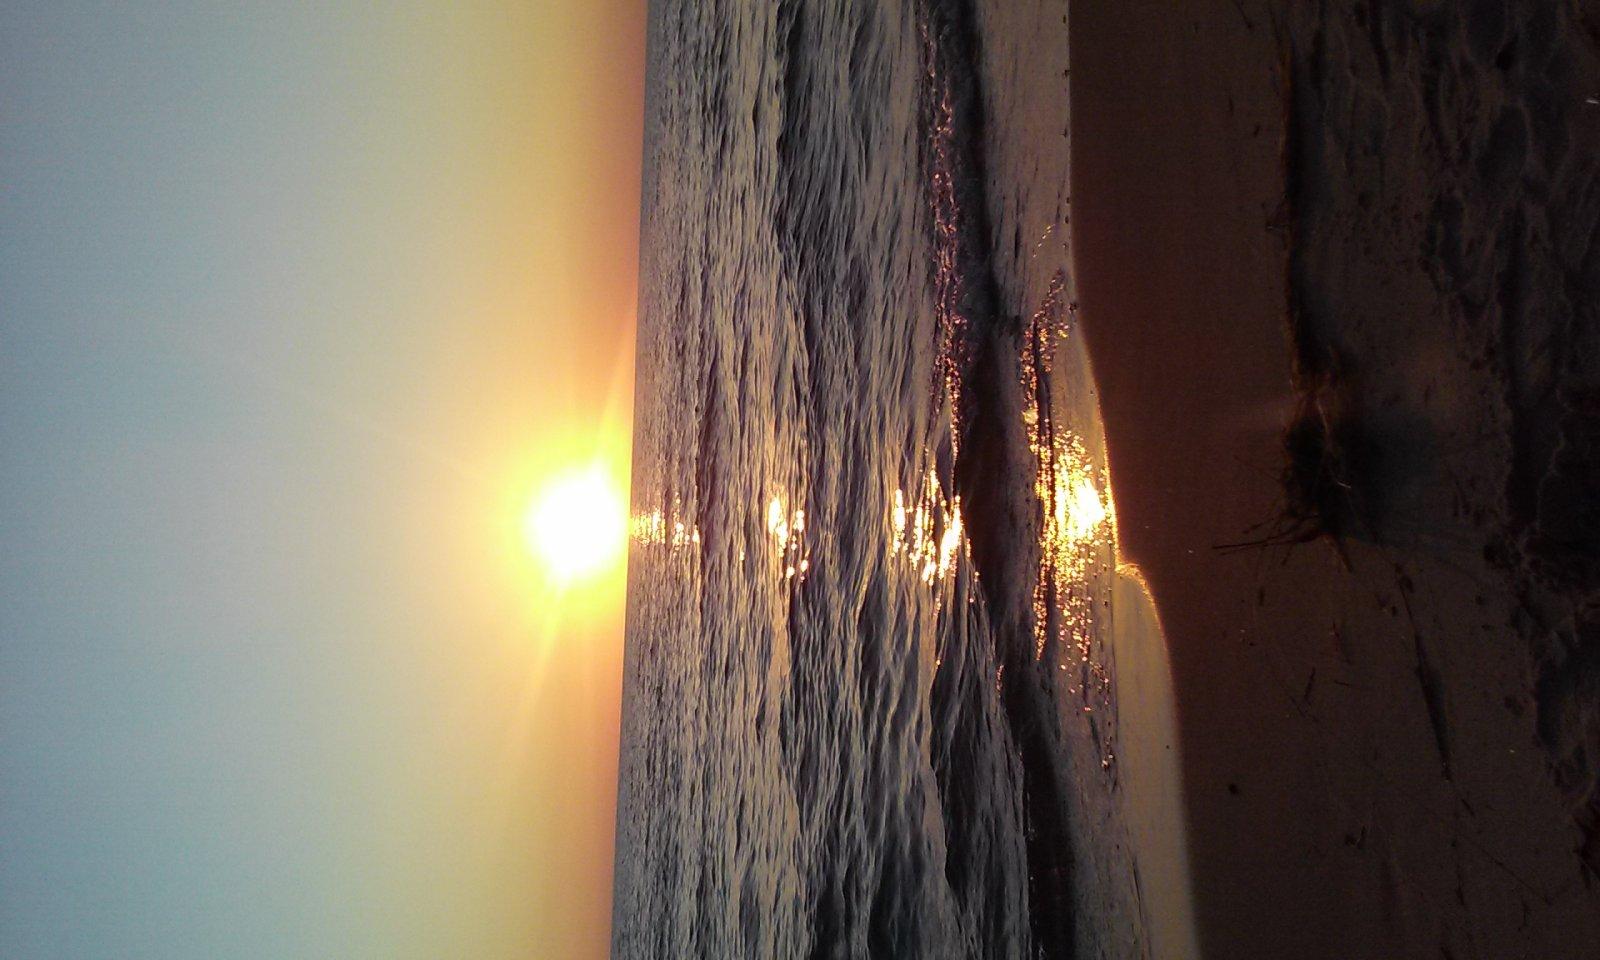 Click image for larger version  Name:Sunset lake MI 2015.jpg Views:134 Size:187.9 KB ID:105302